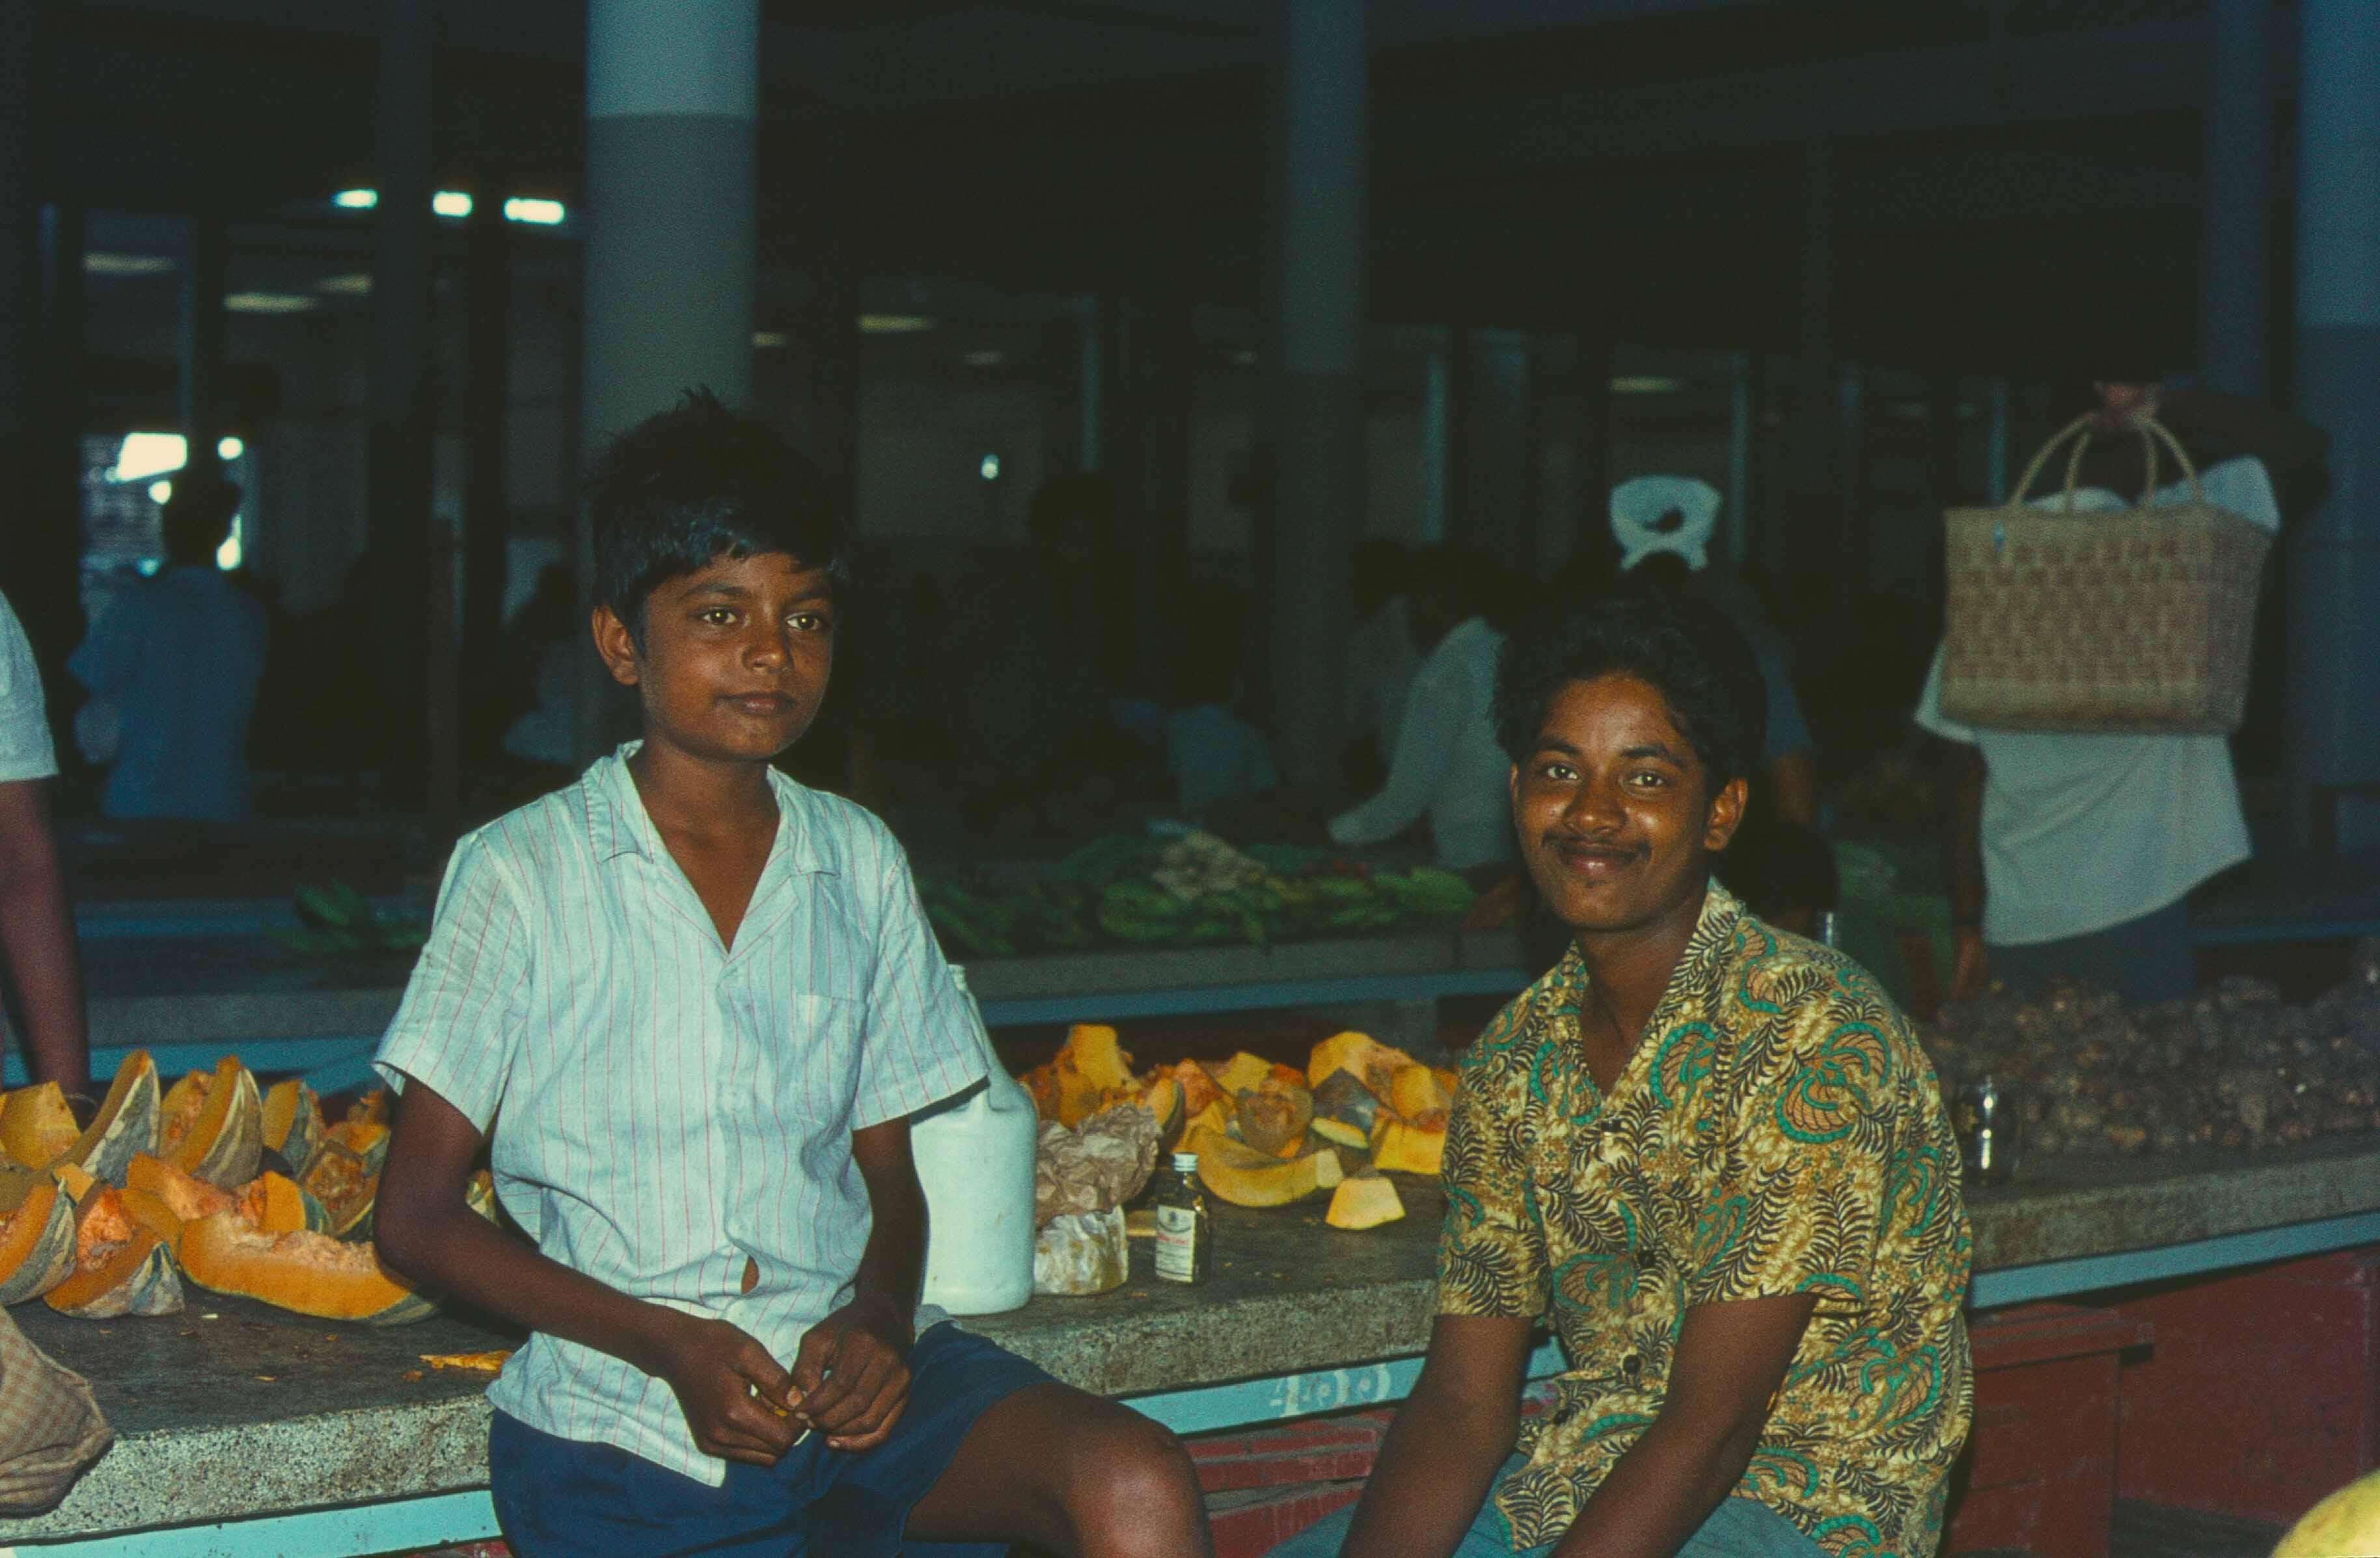 277. Suriname